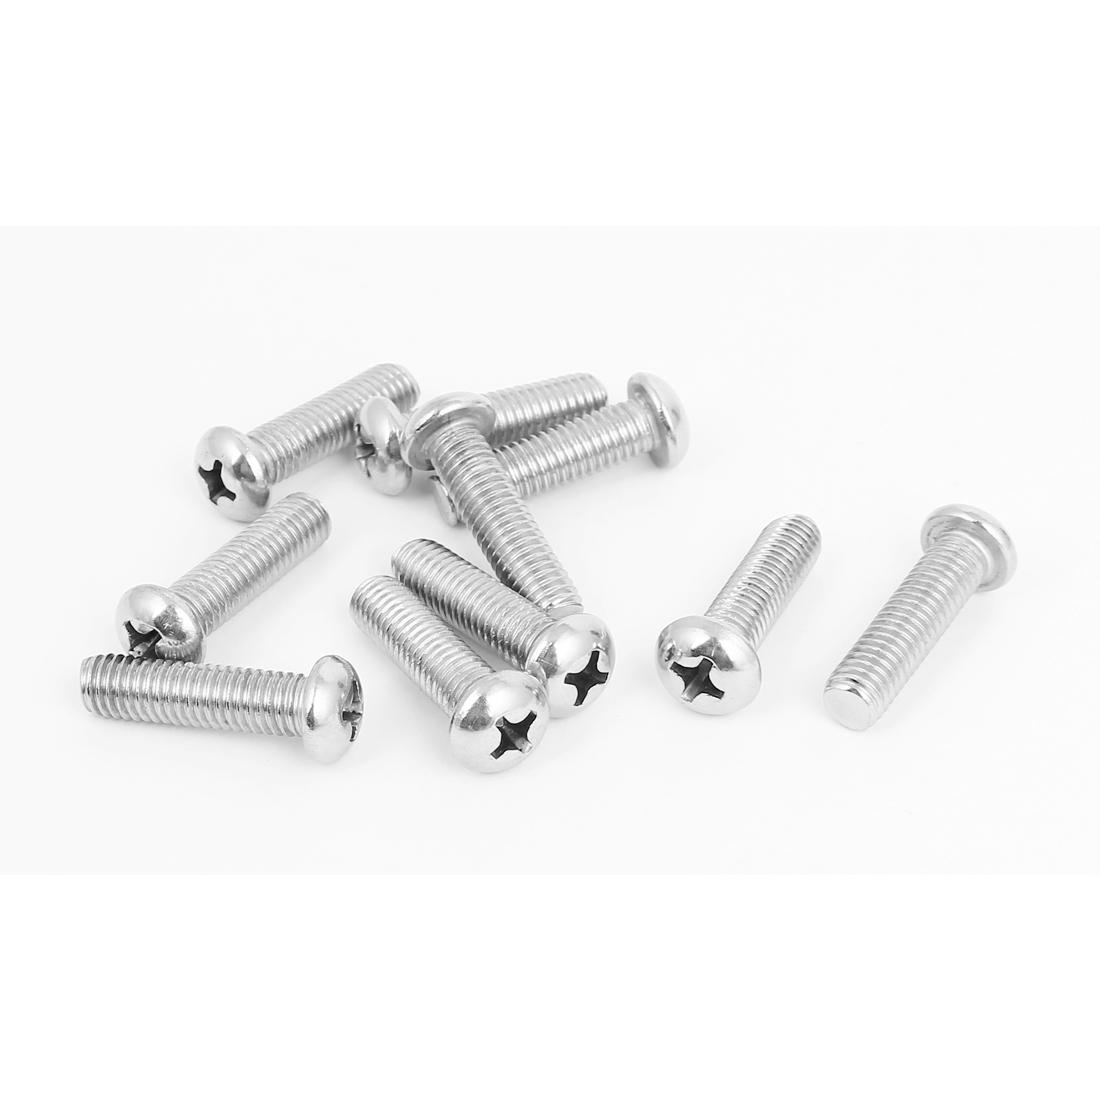 M8x30mm Stainless Steel Phillips Round Pan Head Machine Screws 10pcs